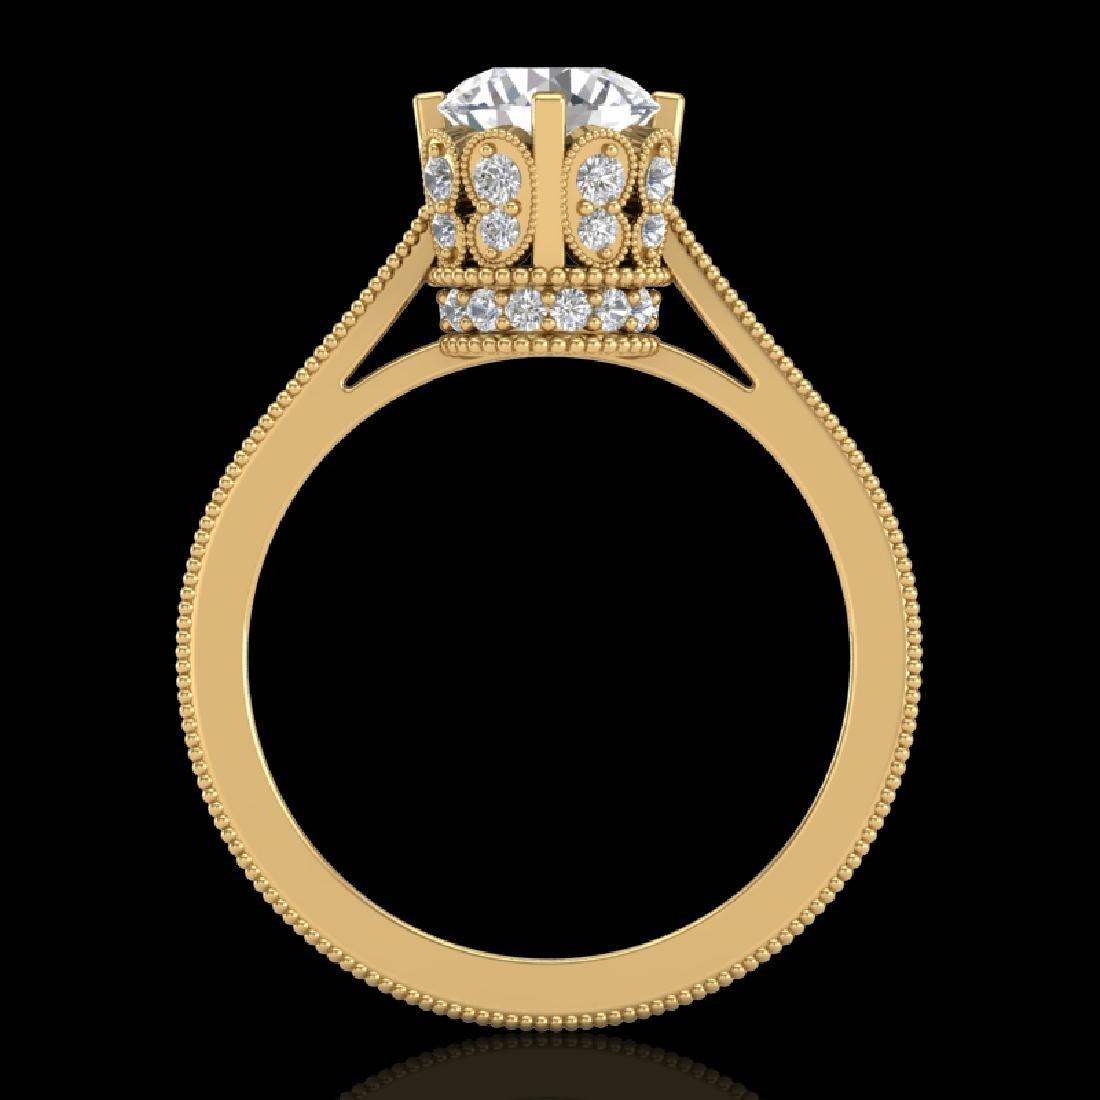 1.5 CTW VS/SI Diamond Art Deco Ring 18K Yellow Gold - 2